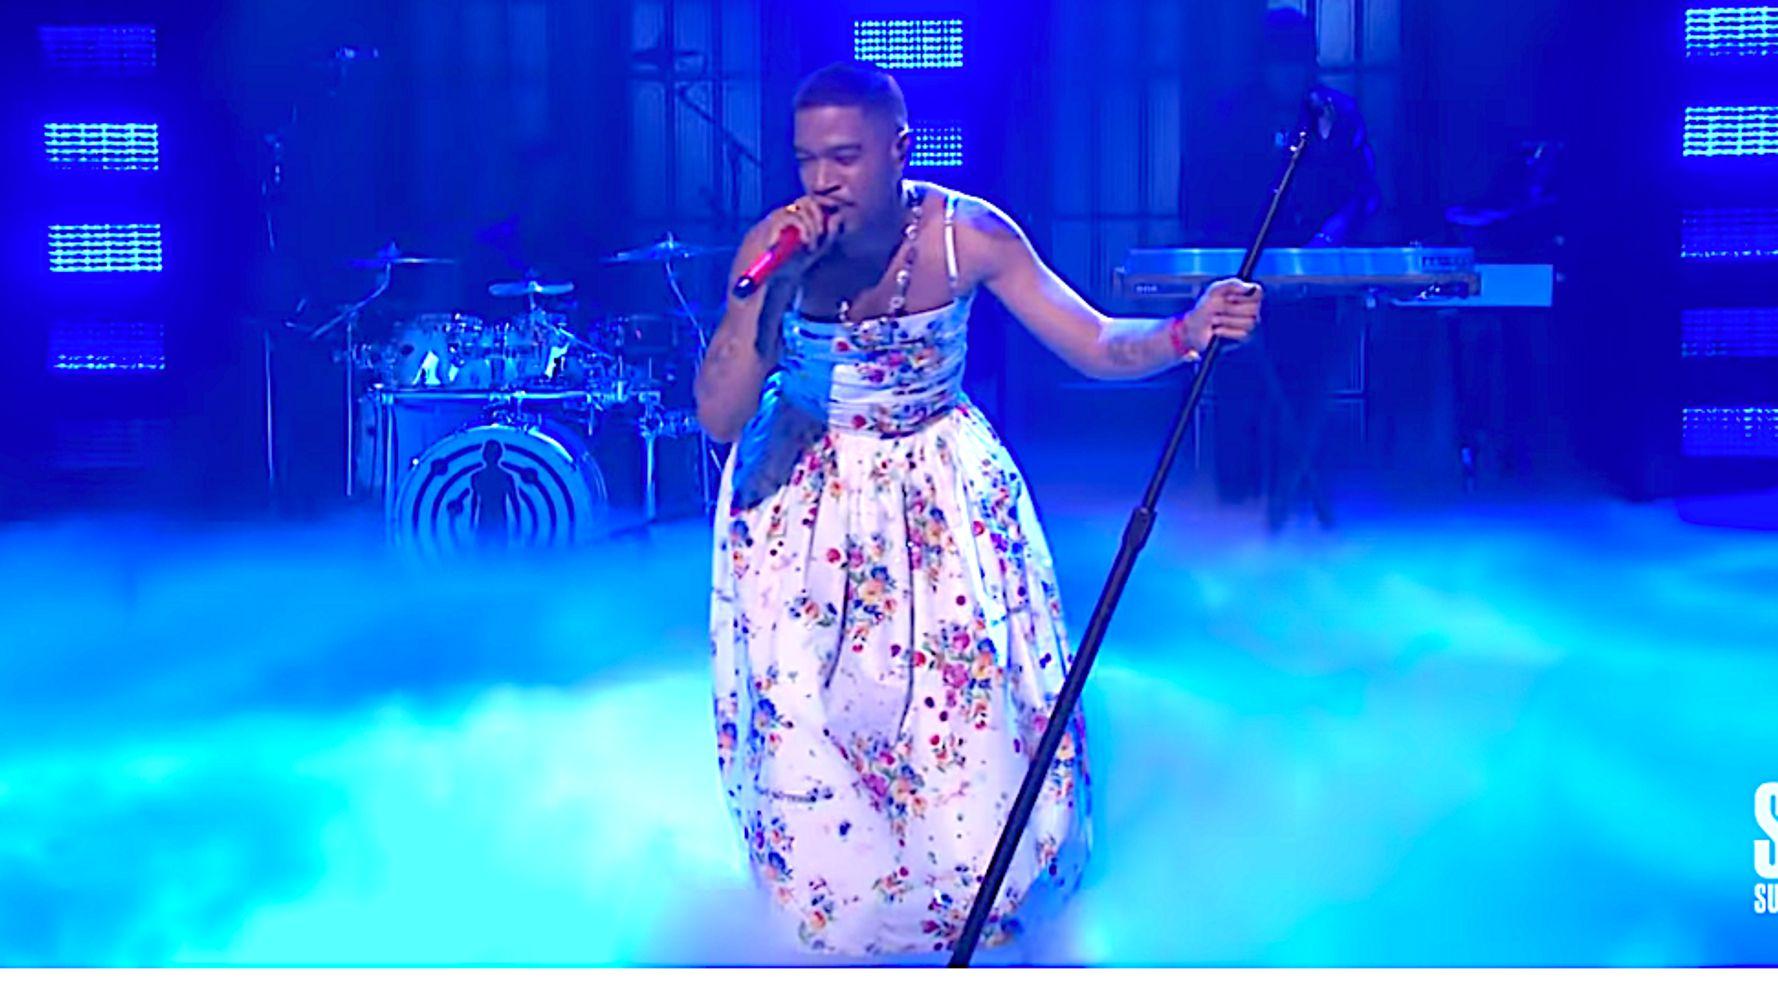 Kid Cudi wears flower dress in honor to Kurt Cobain and Chris Farley during SNL performance